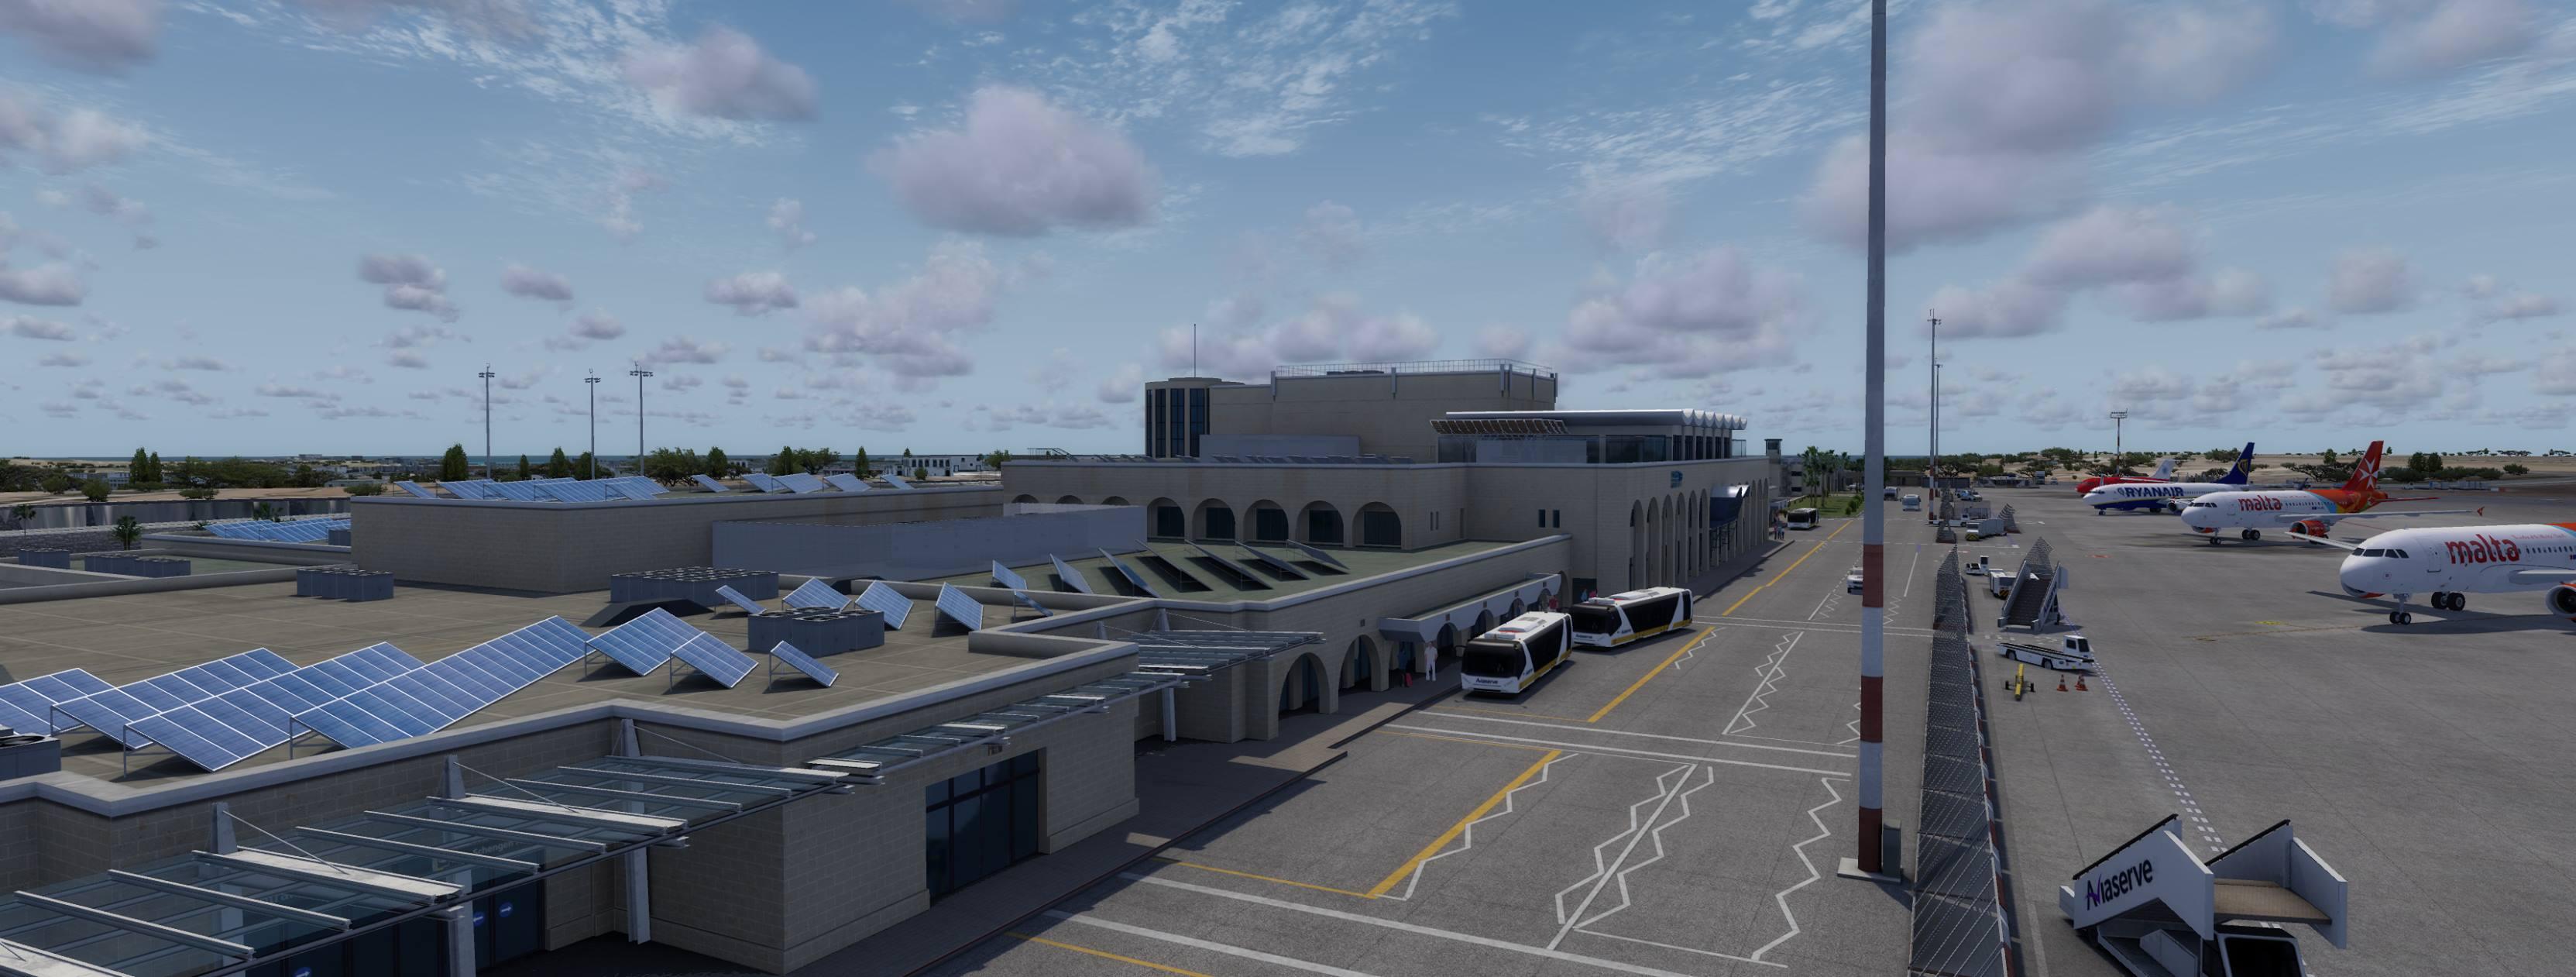 Justsim Malta Airport 6